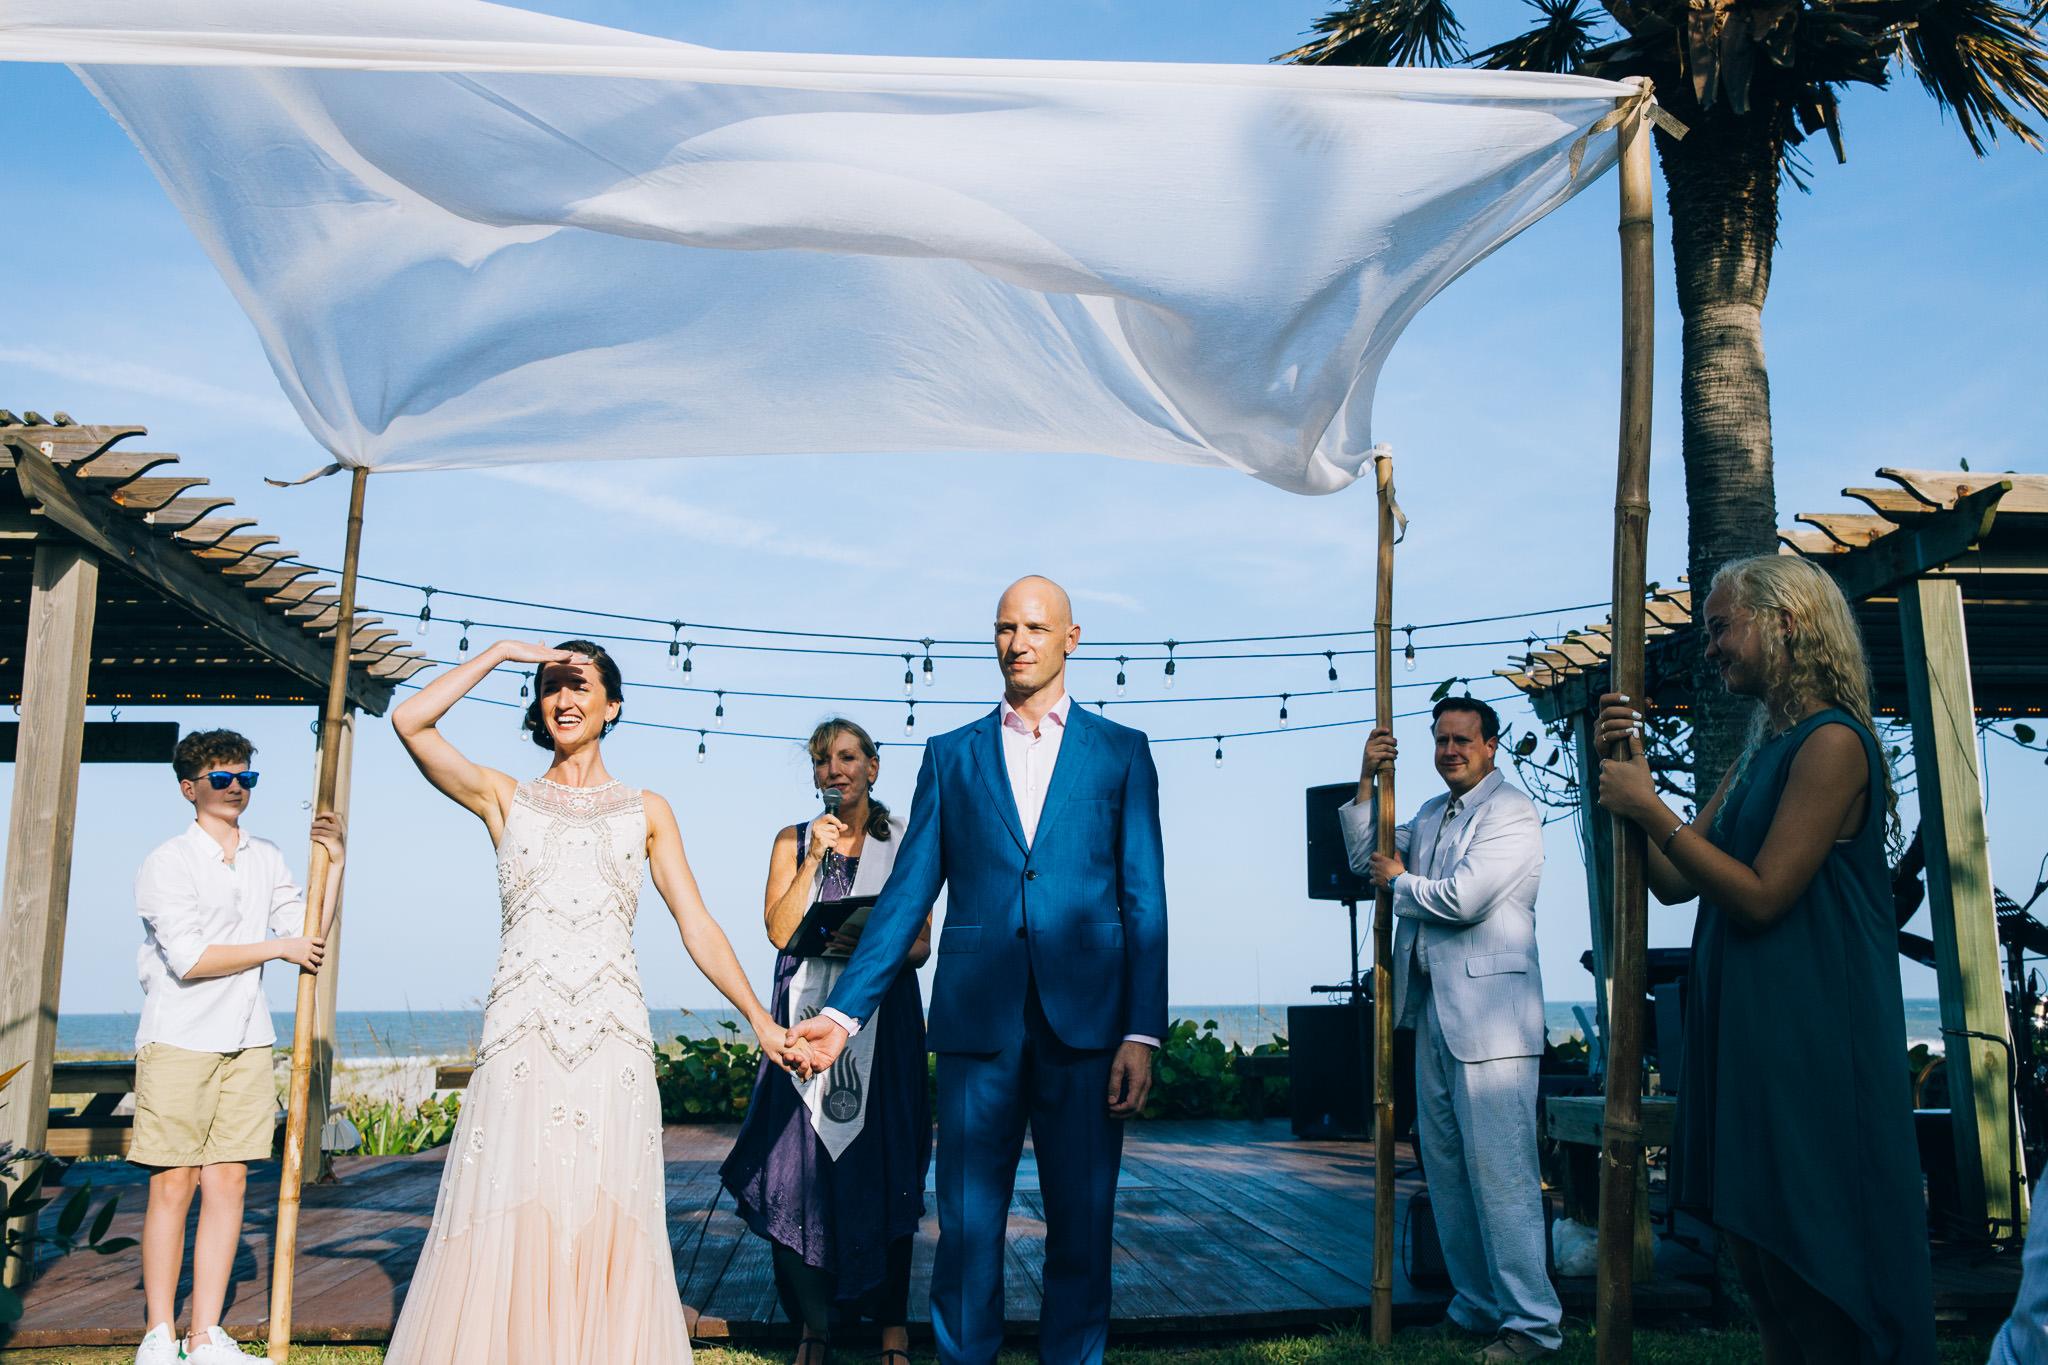 036_Canadian-destination-wedding-photogr